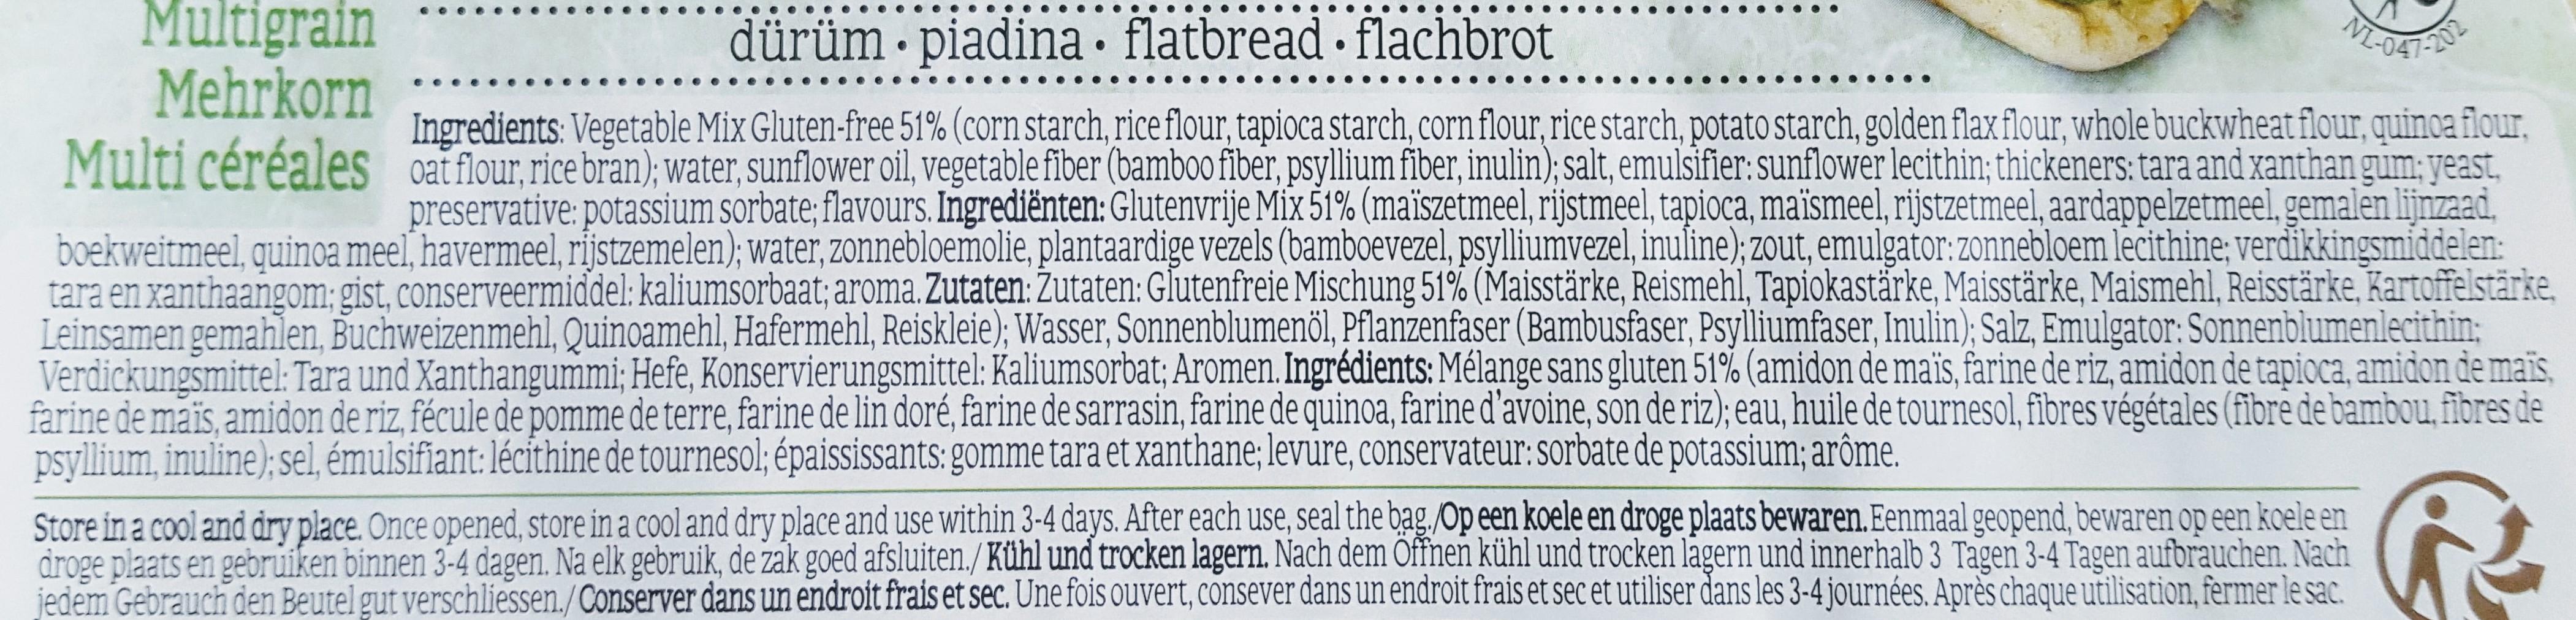 glutenvrije wrap consenza ingredienten